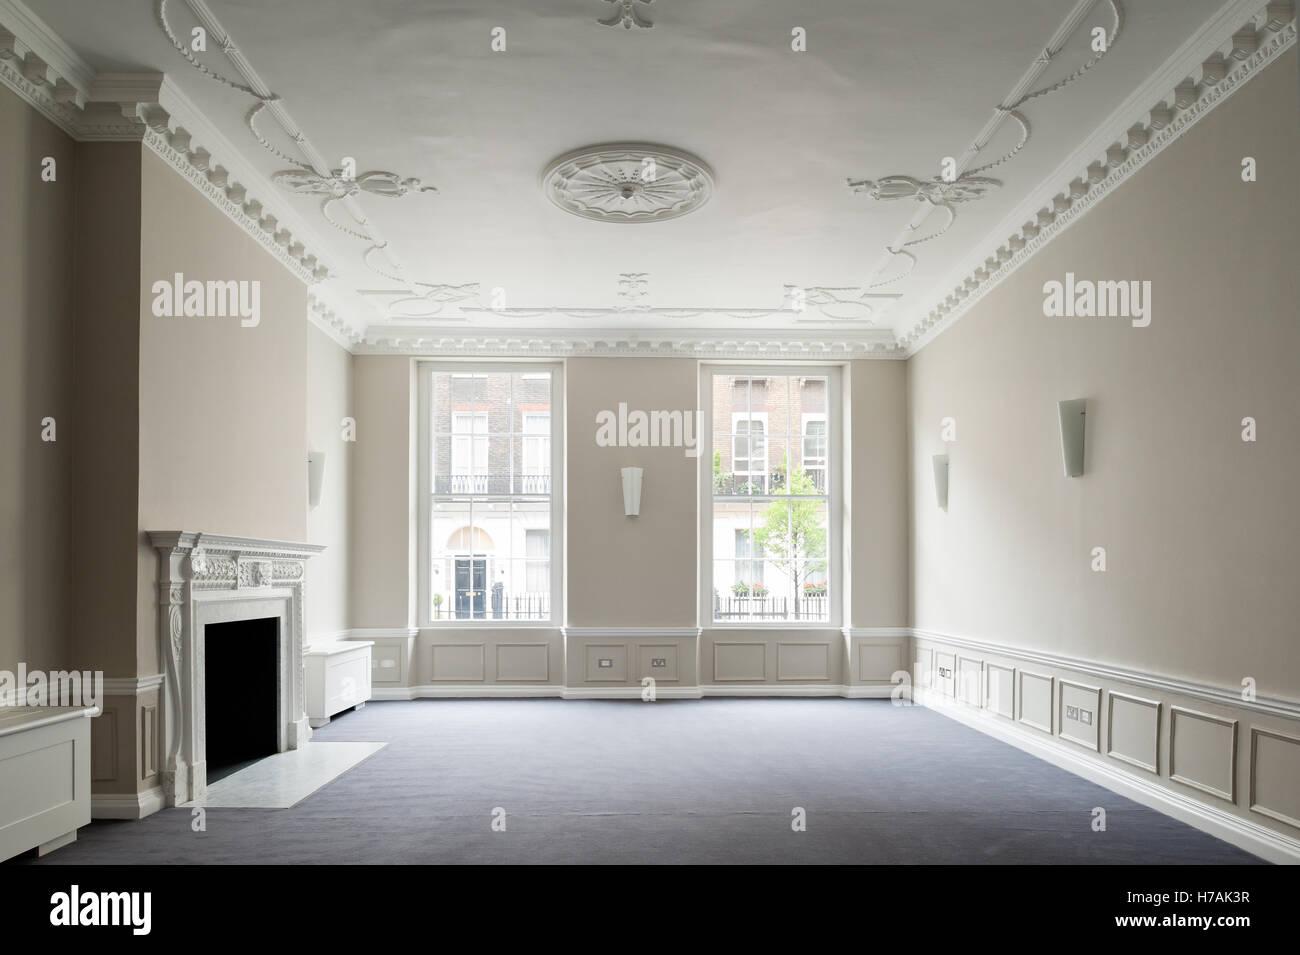 Plasterwork ceiling detail in Gloucester Place interior, London, England, UK - Stock Image